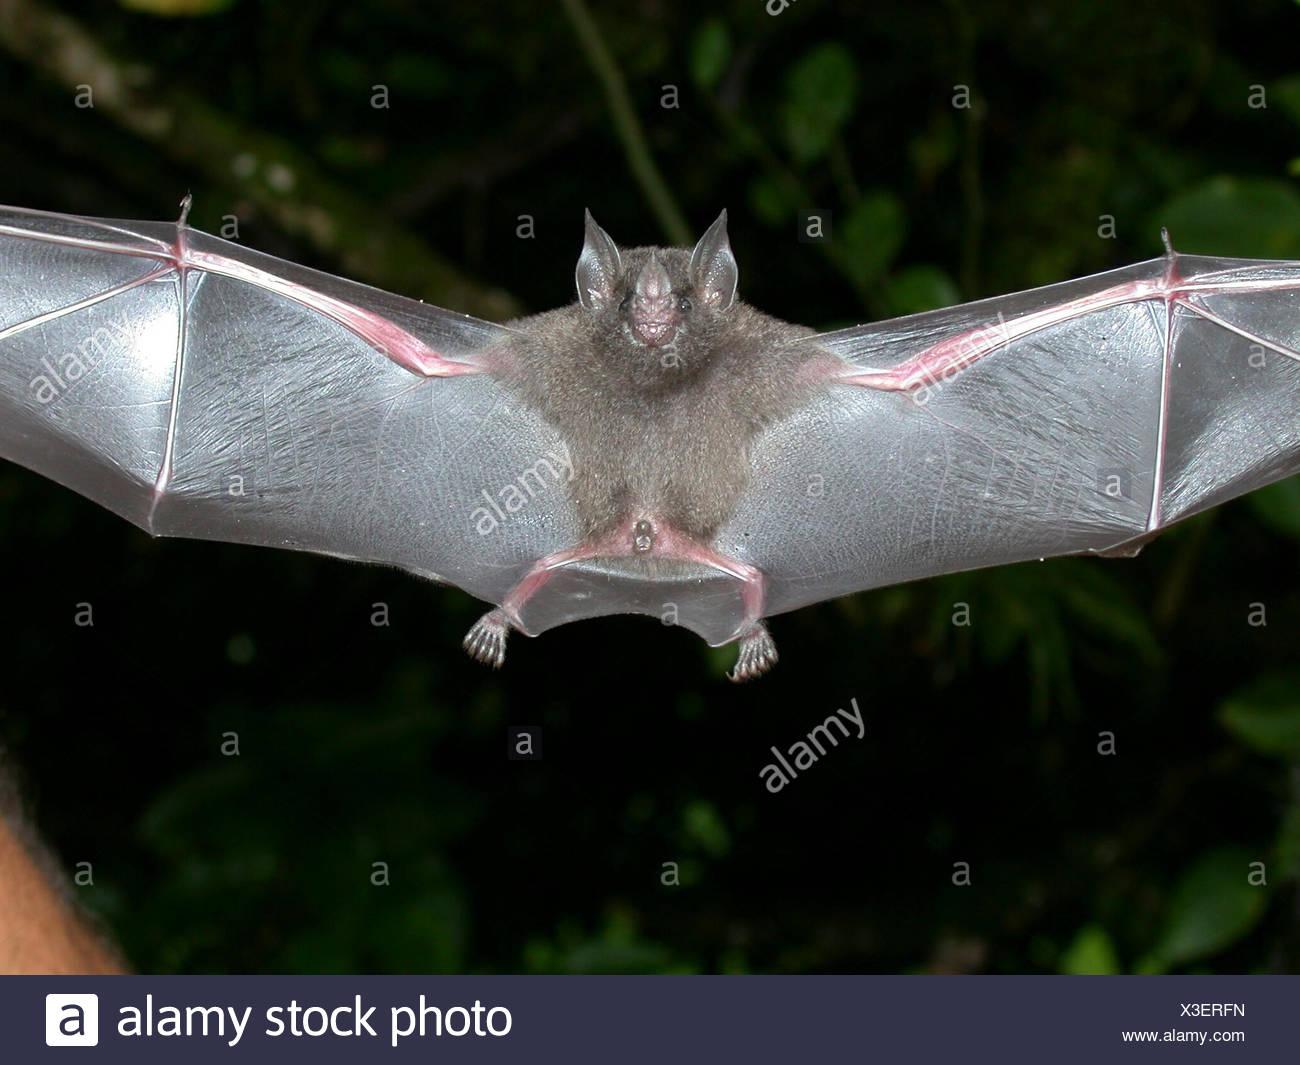 A flying tent-making bat, Uroderma bilobatum. Stock Photo